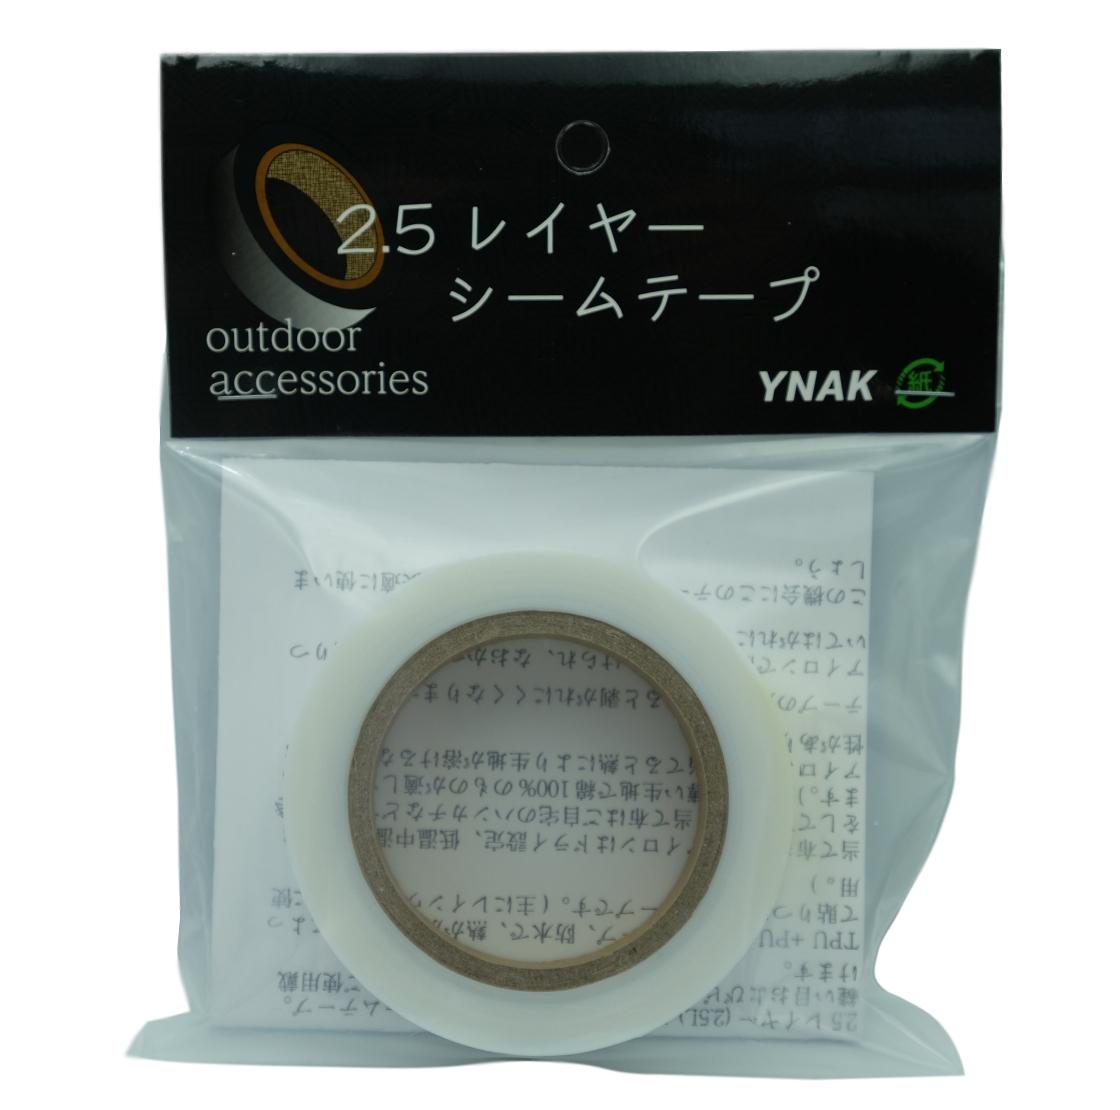 YNAK レインウェア 2.5レイヤー 対応 シームテープ 補修 メンテナンス アイロン式 説明書 (透明, 幅18mm×長さ20m)